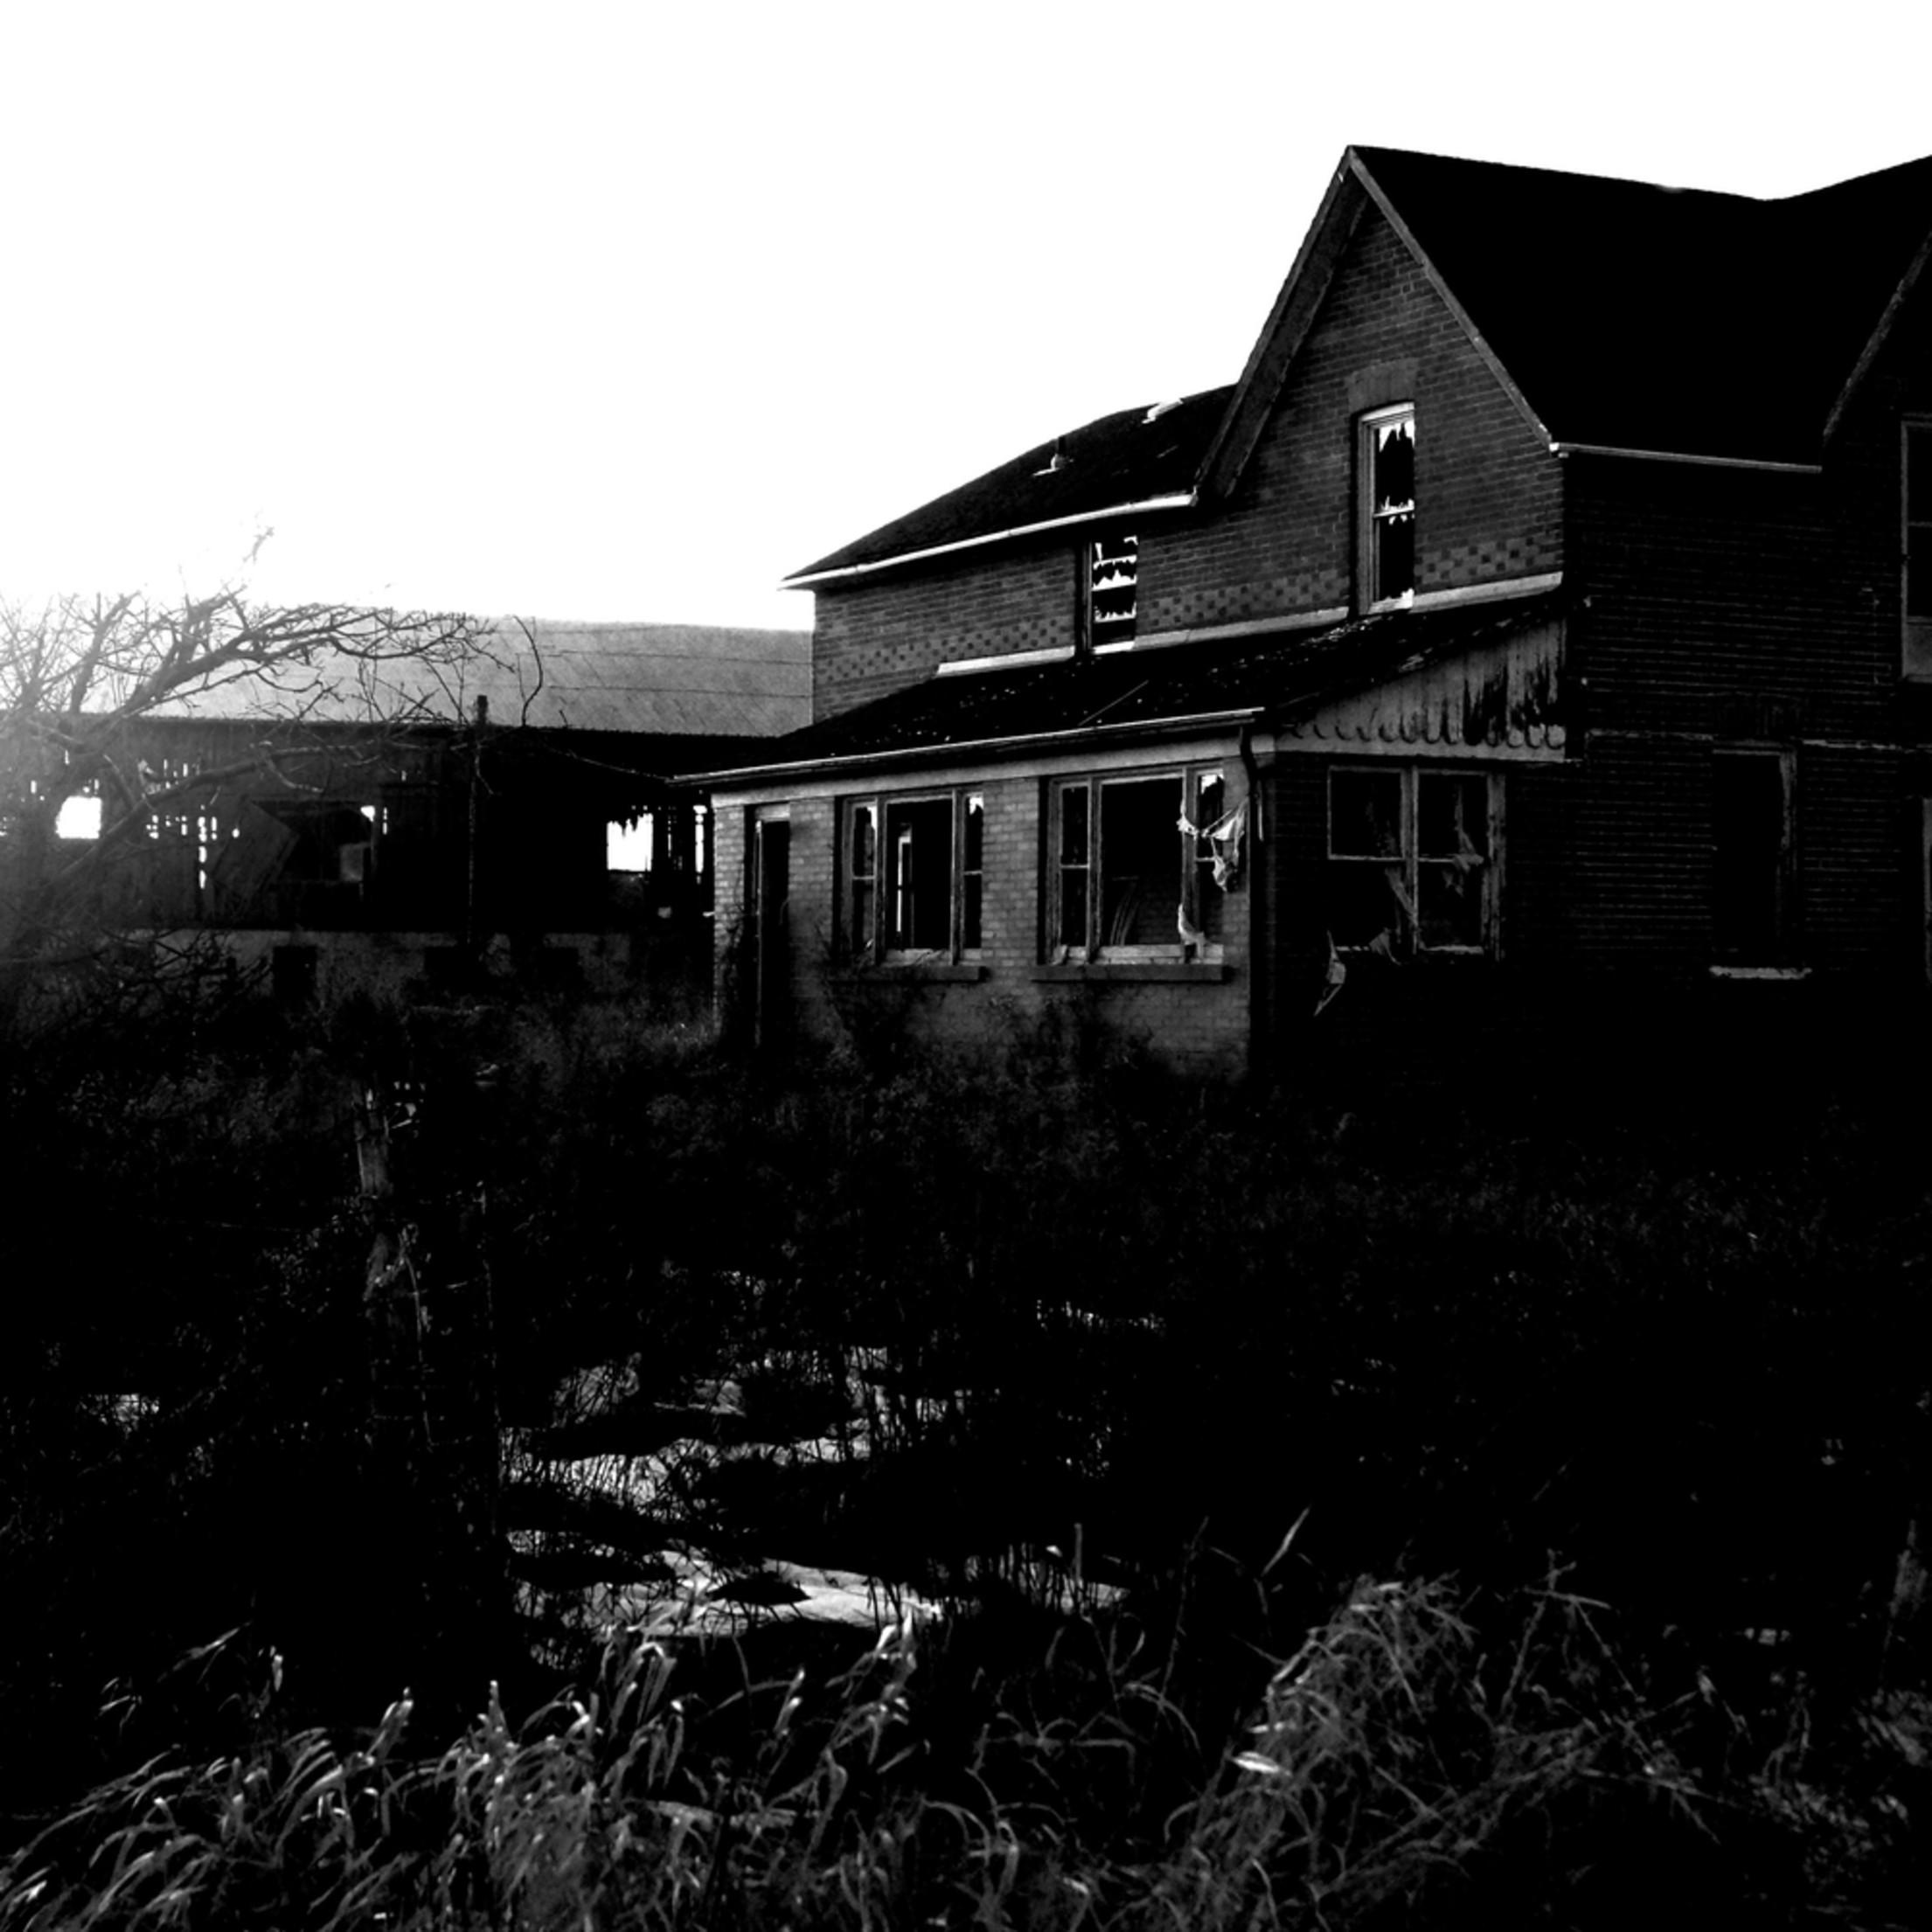 Rural decay xcgdjp